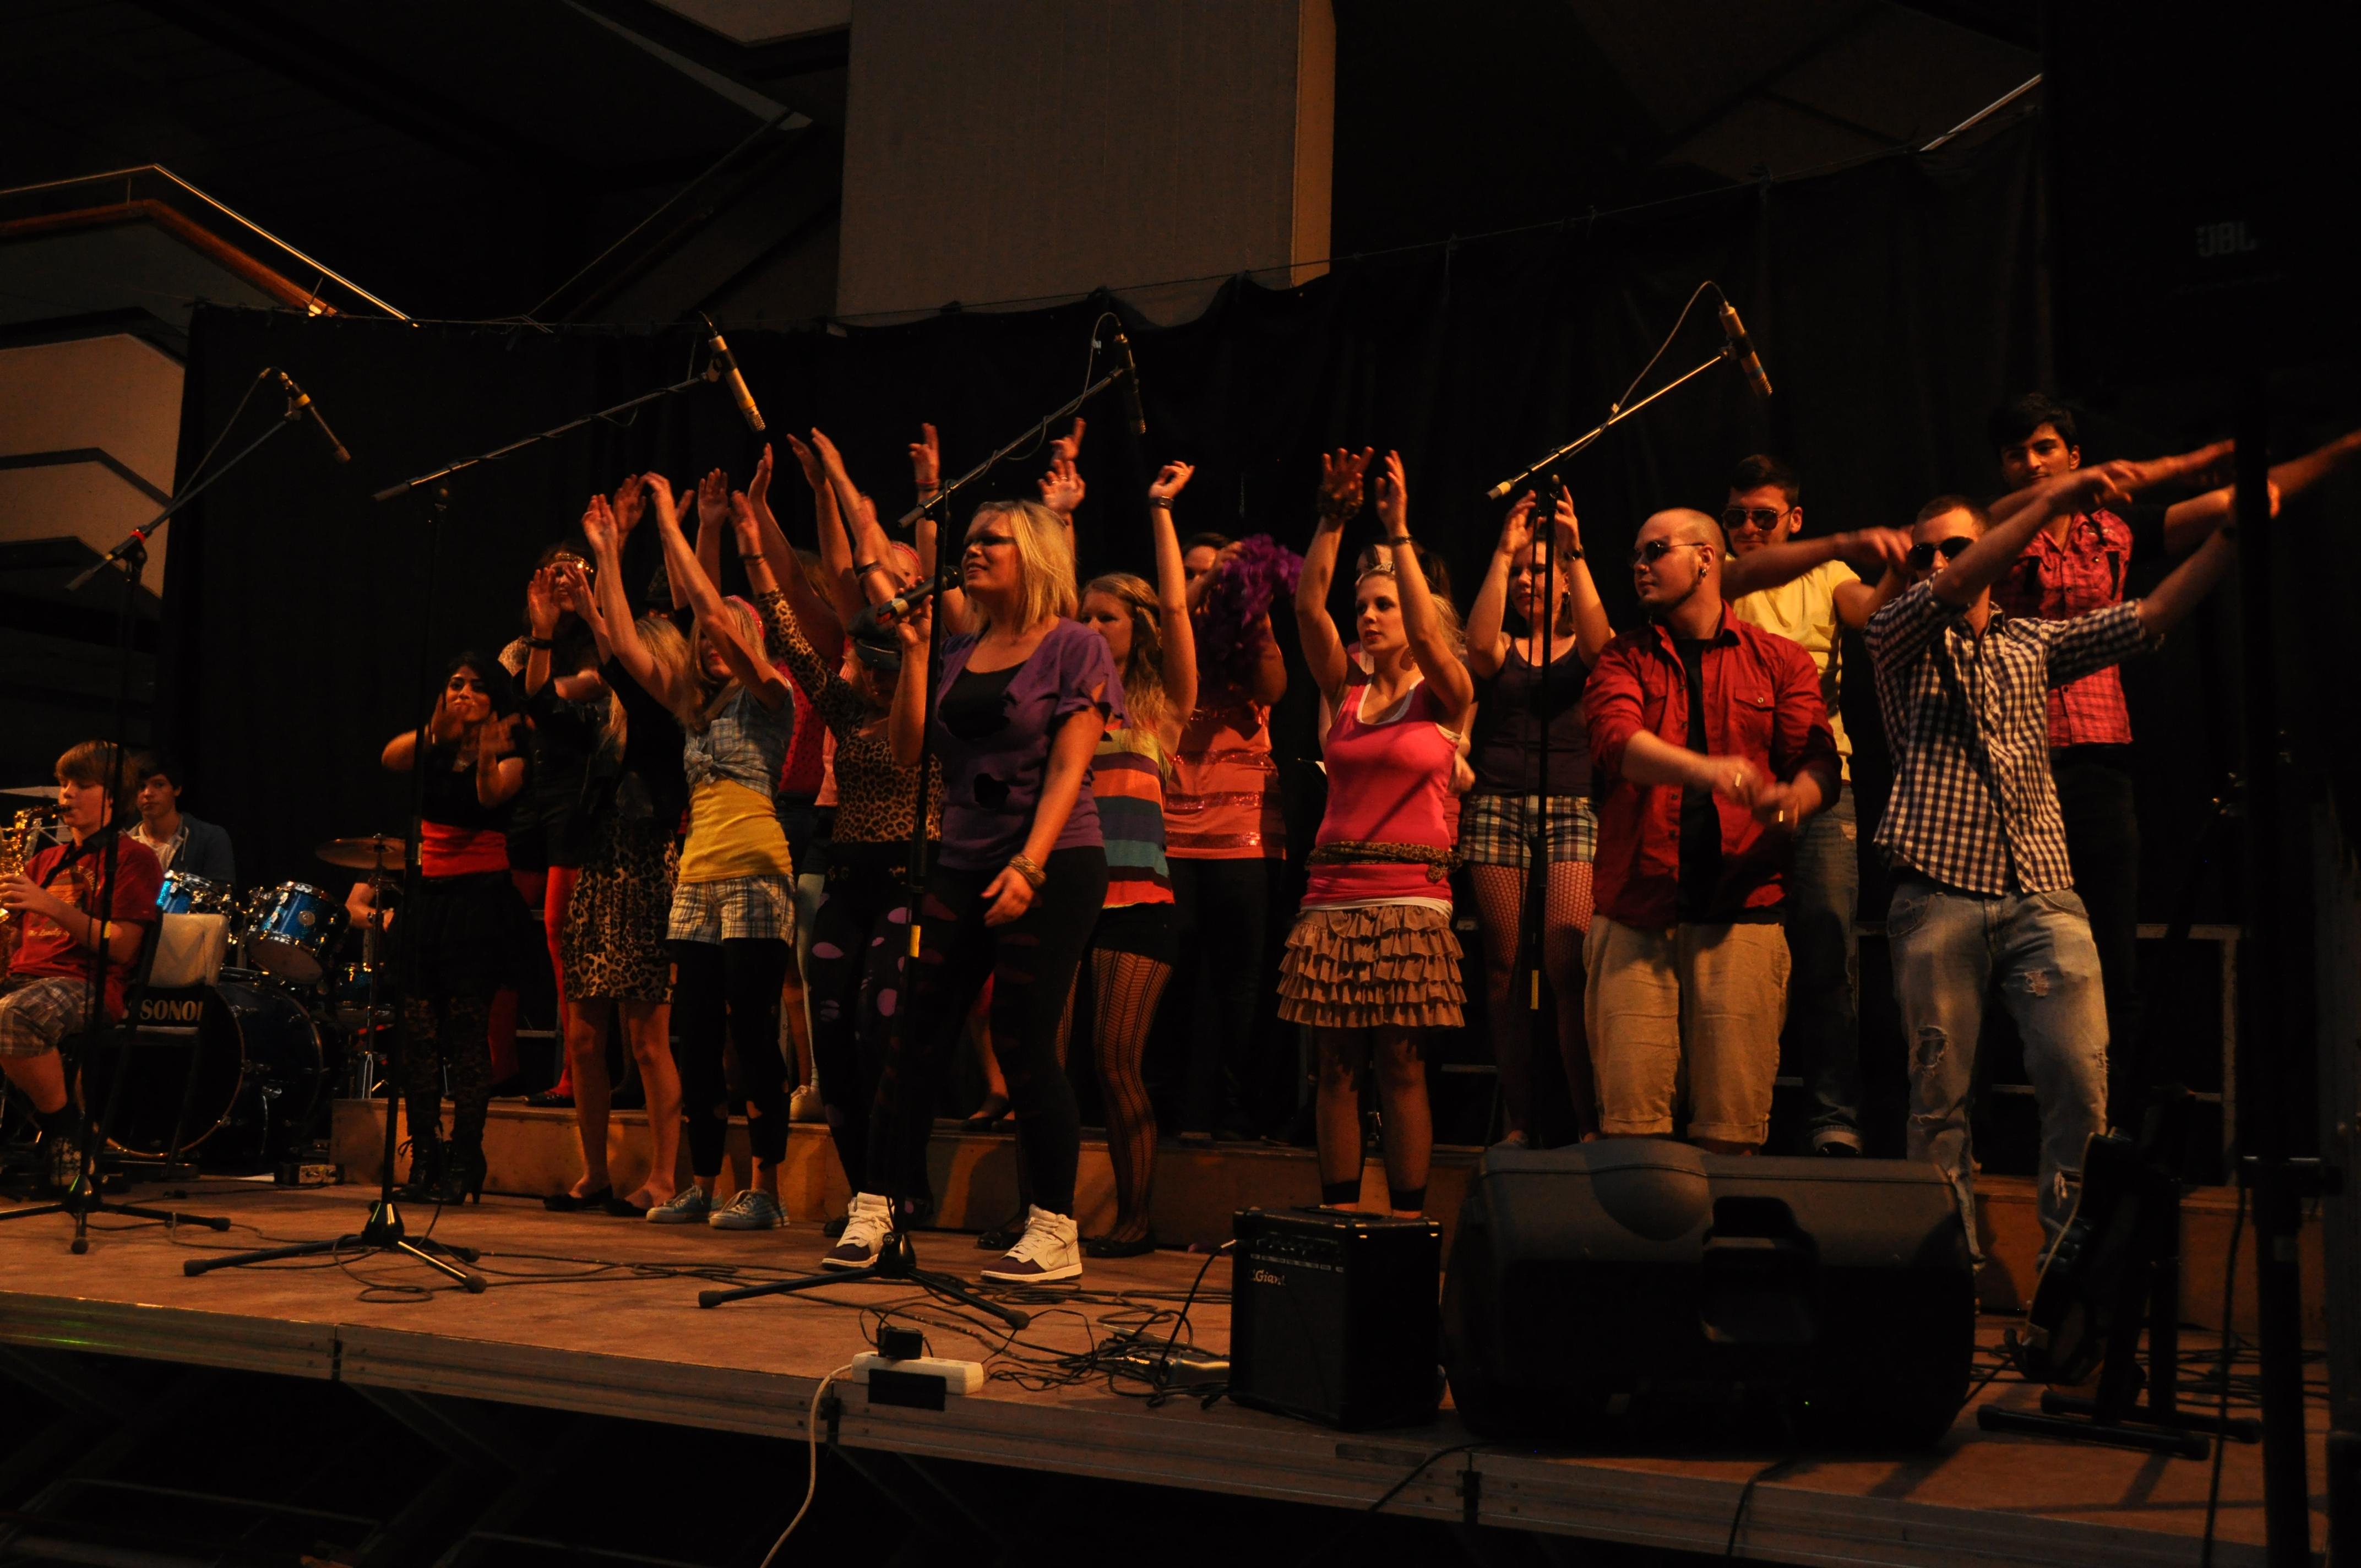 08.06.2011_Querbeat (4)